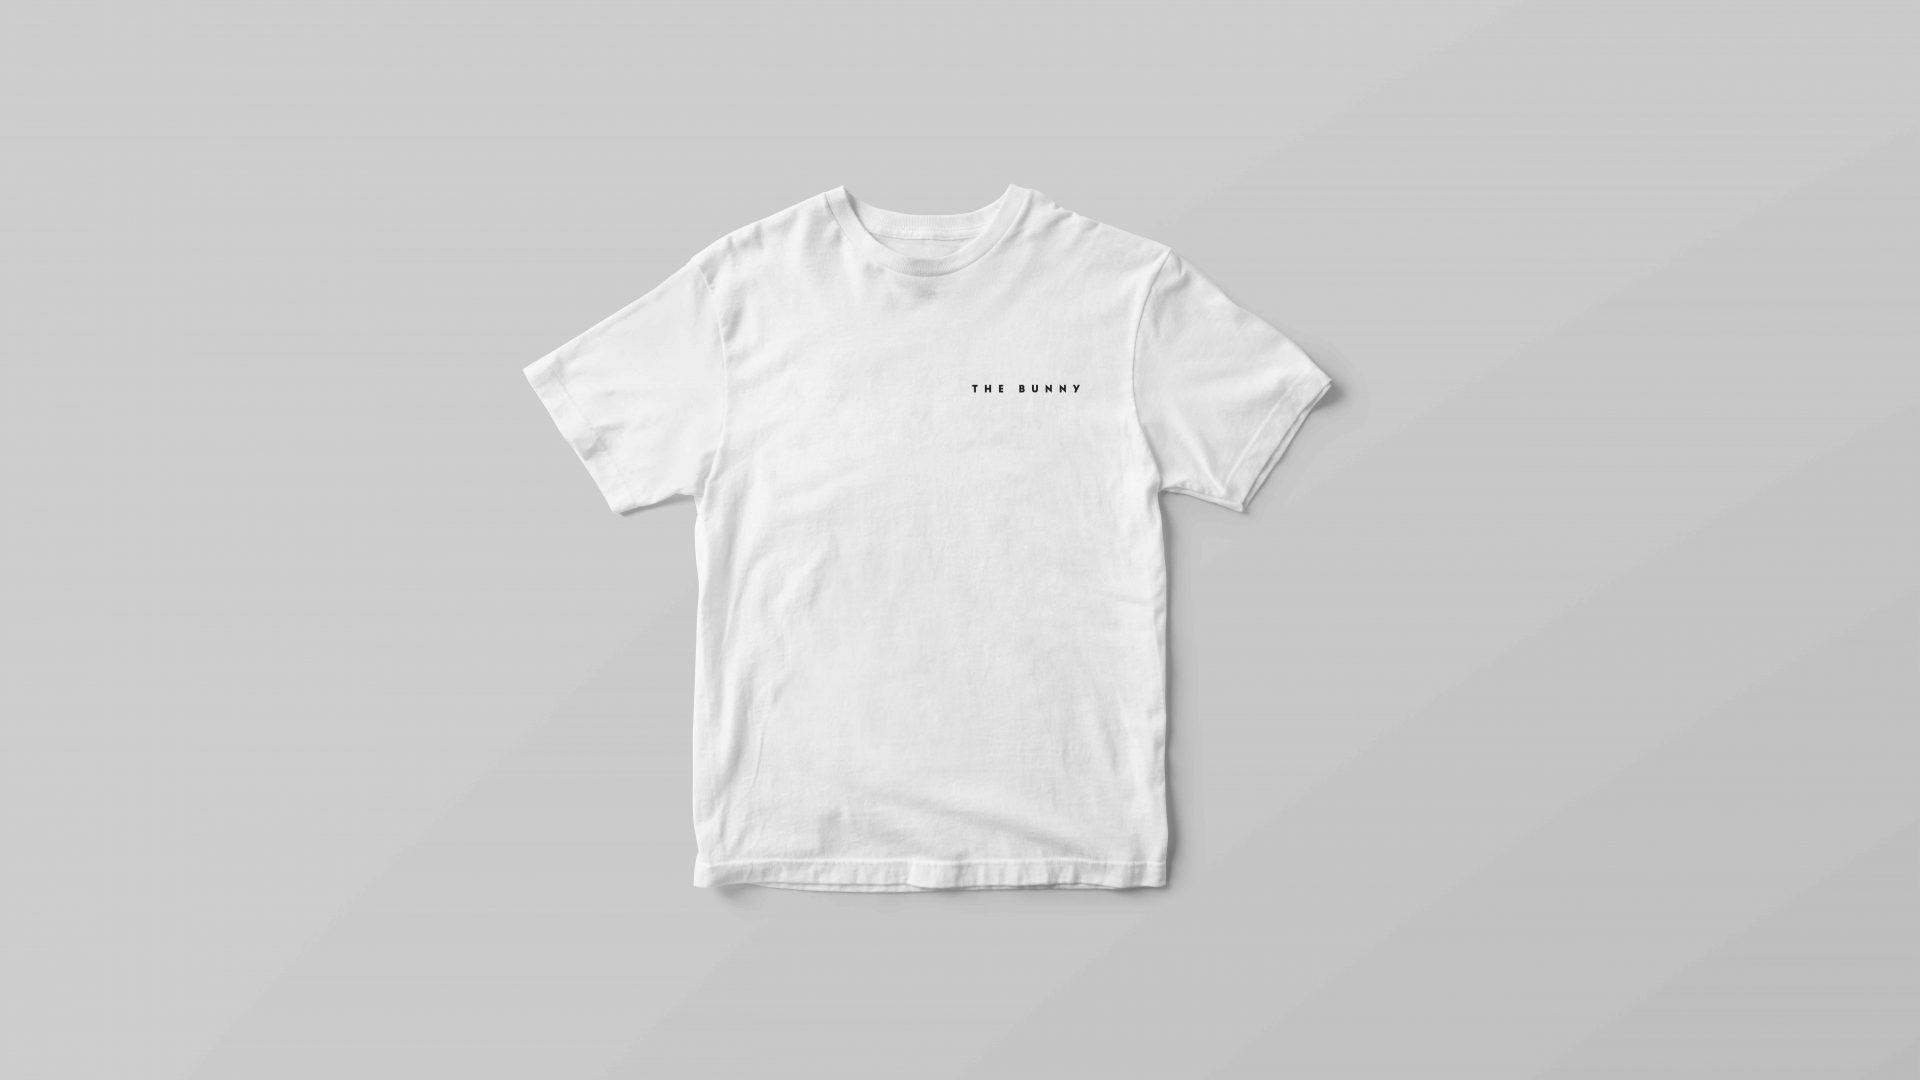 Crate47 Branding forThe Bunny boba tea store – black logo design on white T-shirt